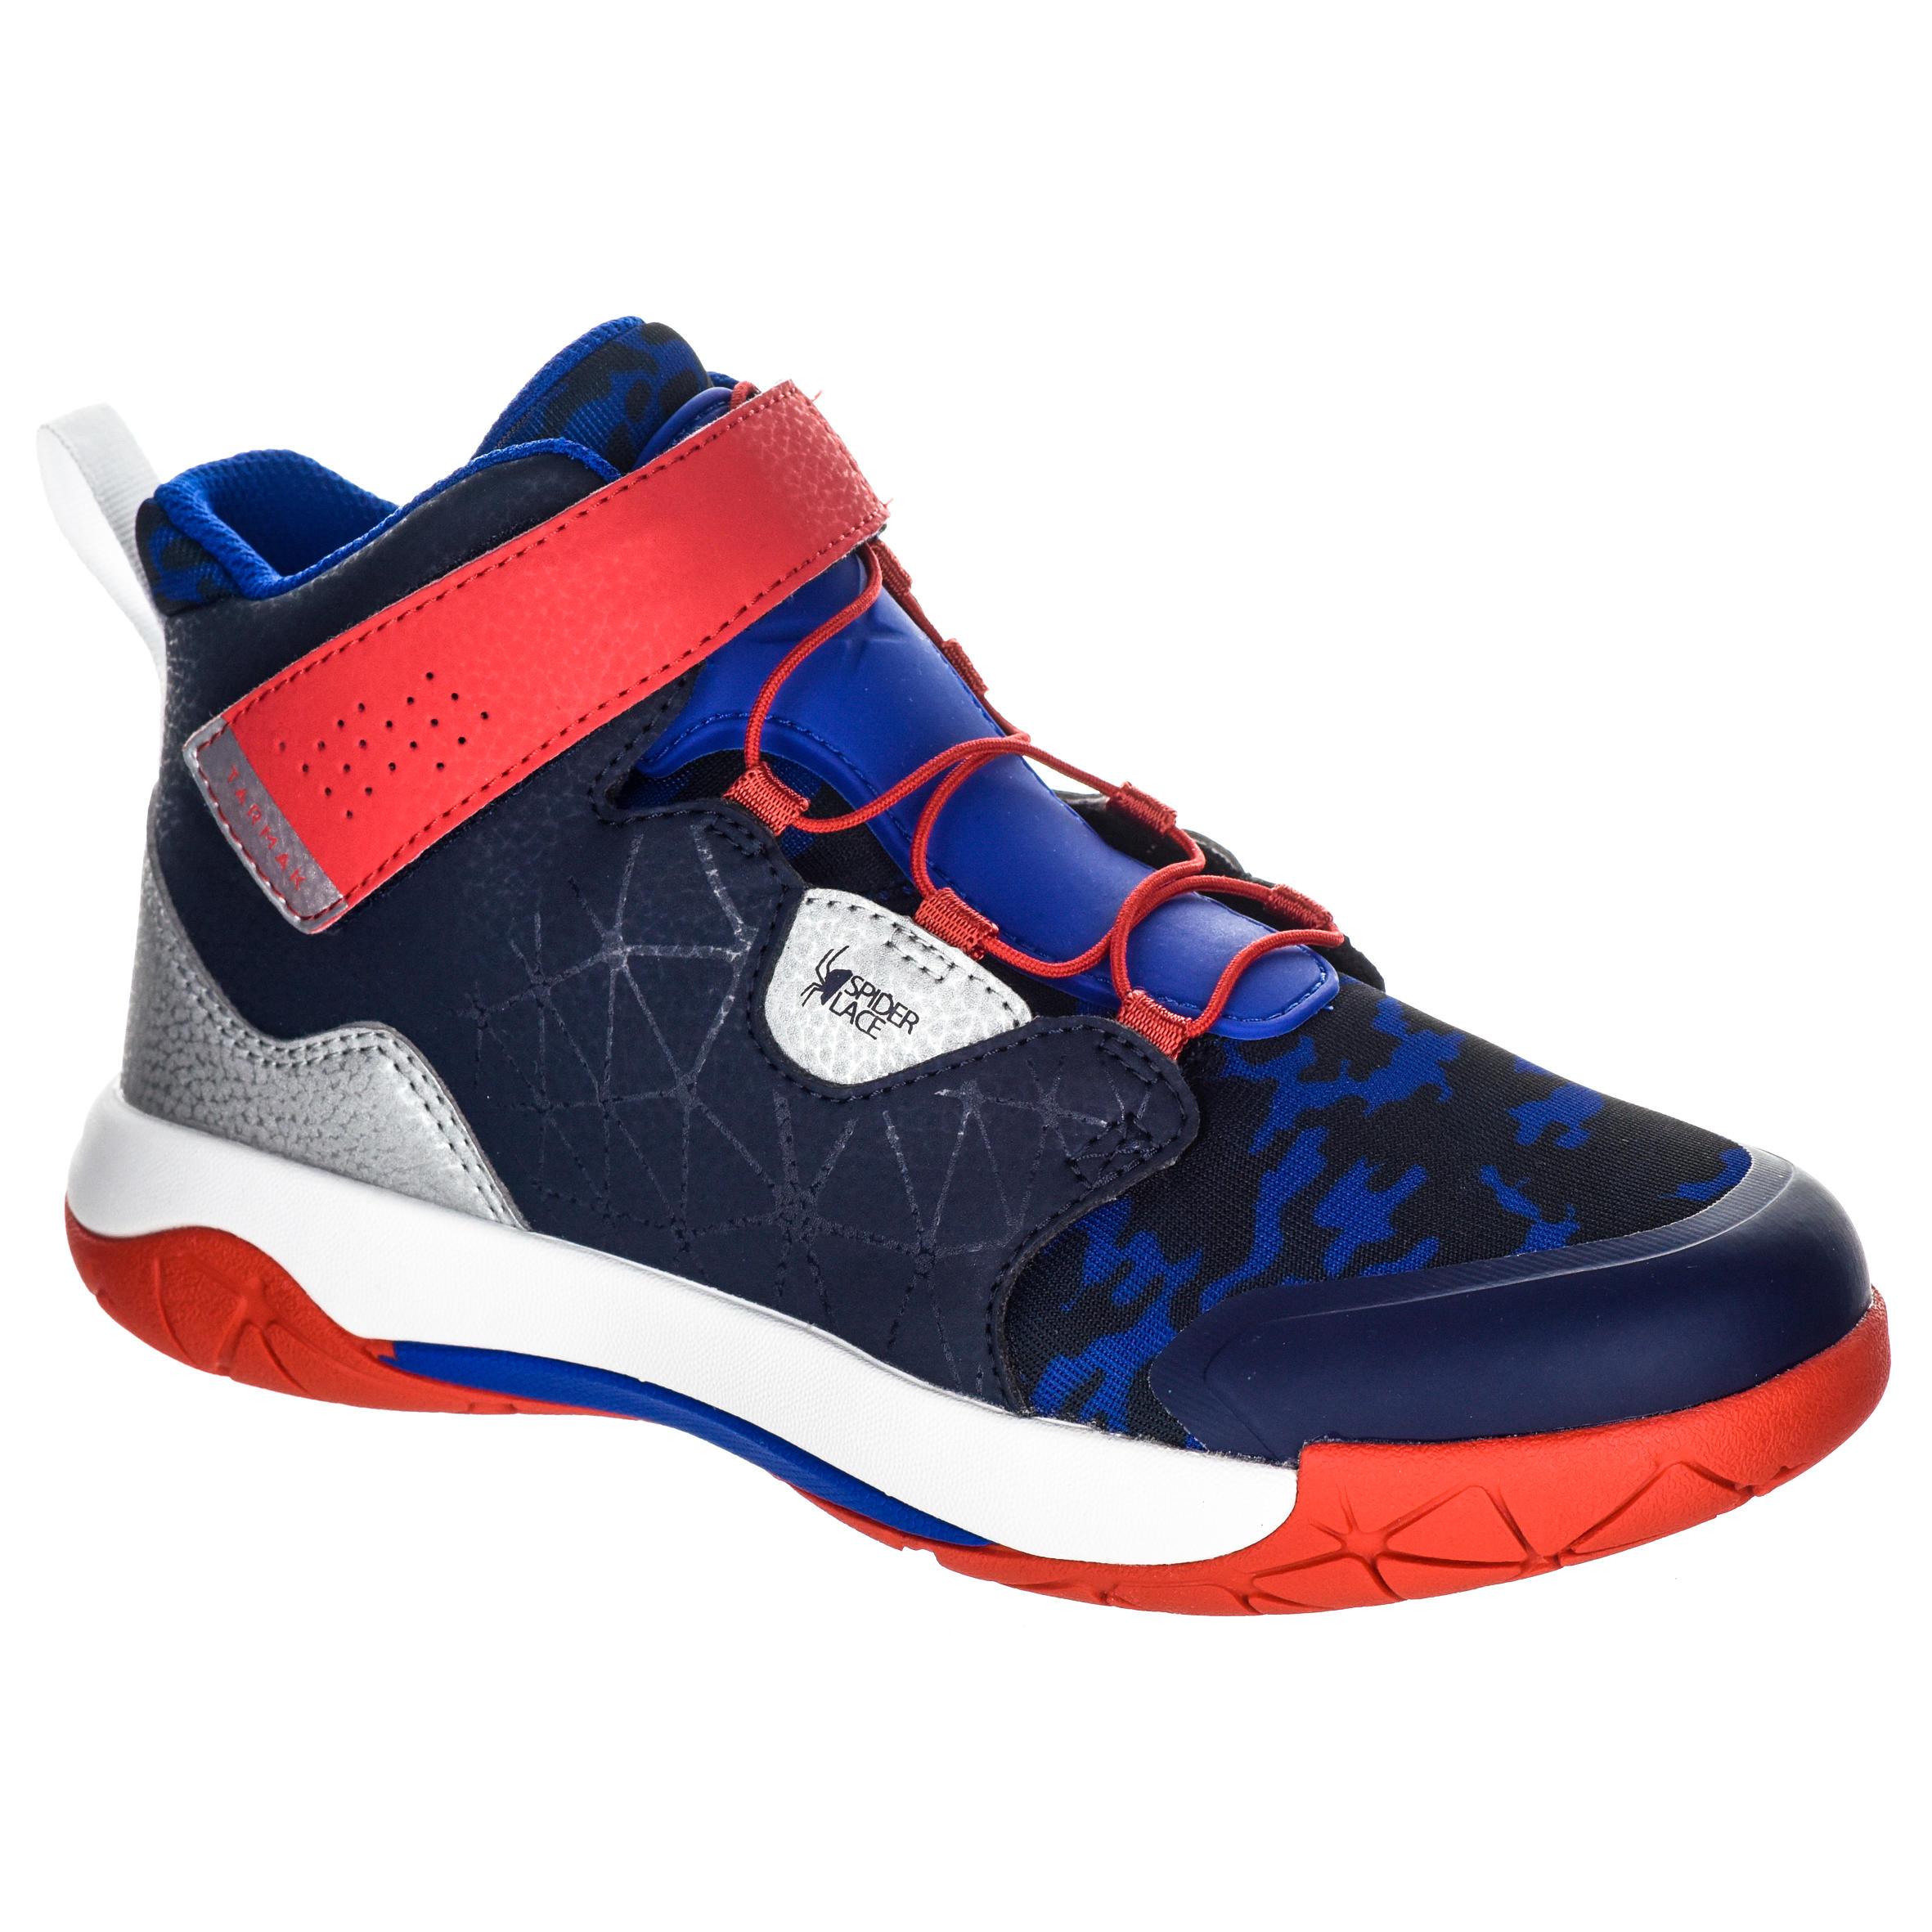 2588001 Tarmak Basketbalschoenen Spider Lace dames halfgevorderden blauw rood